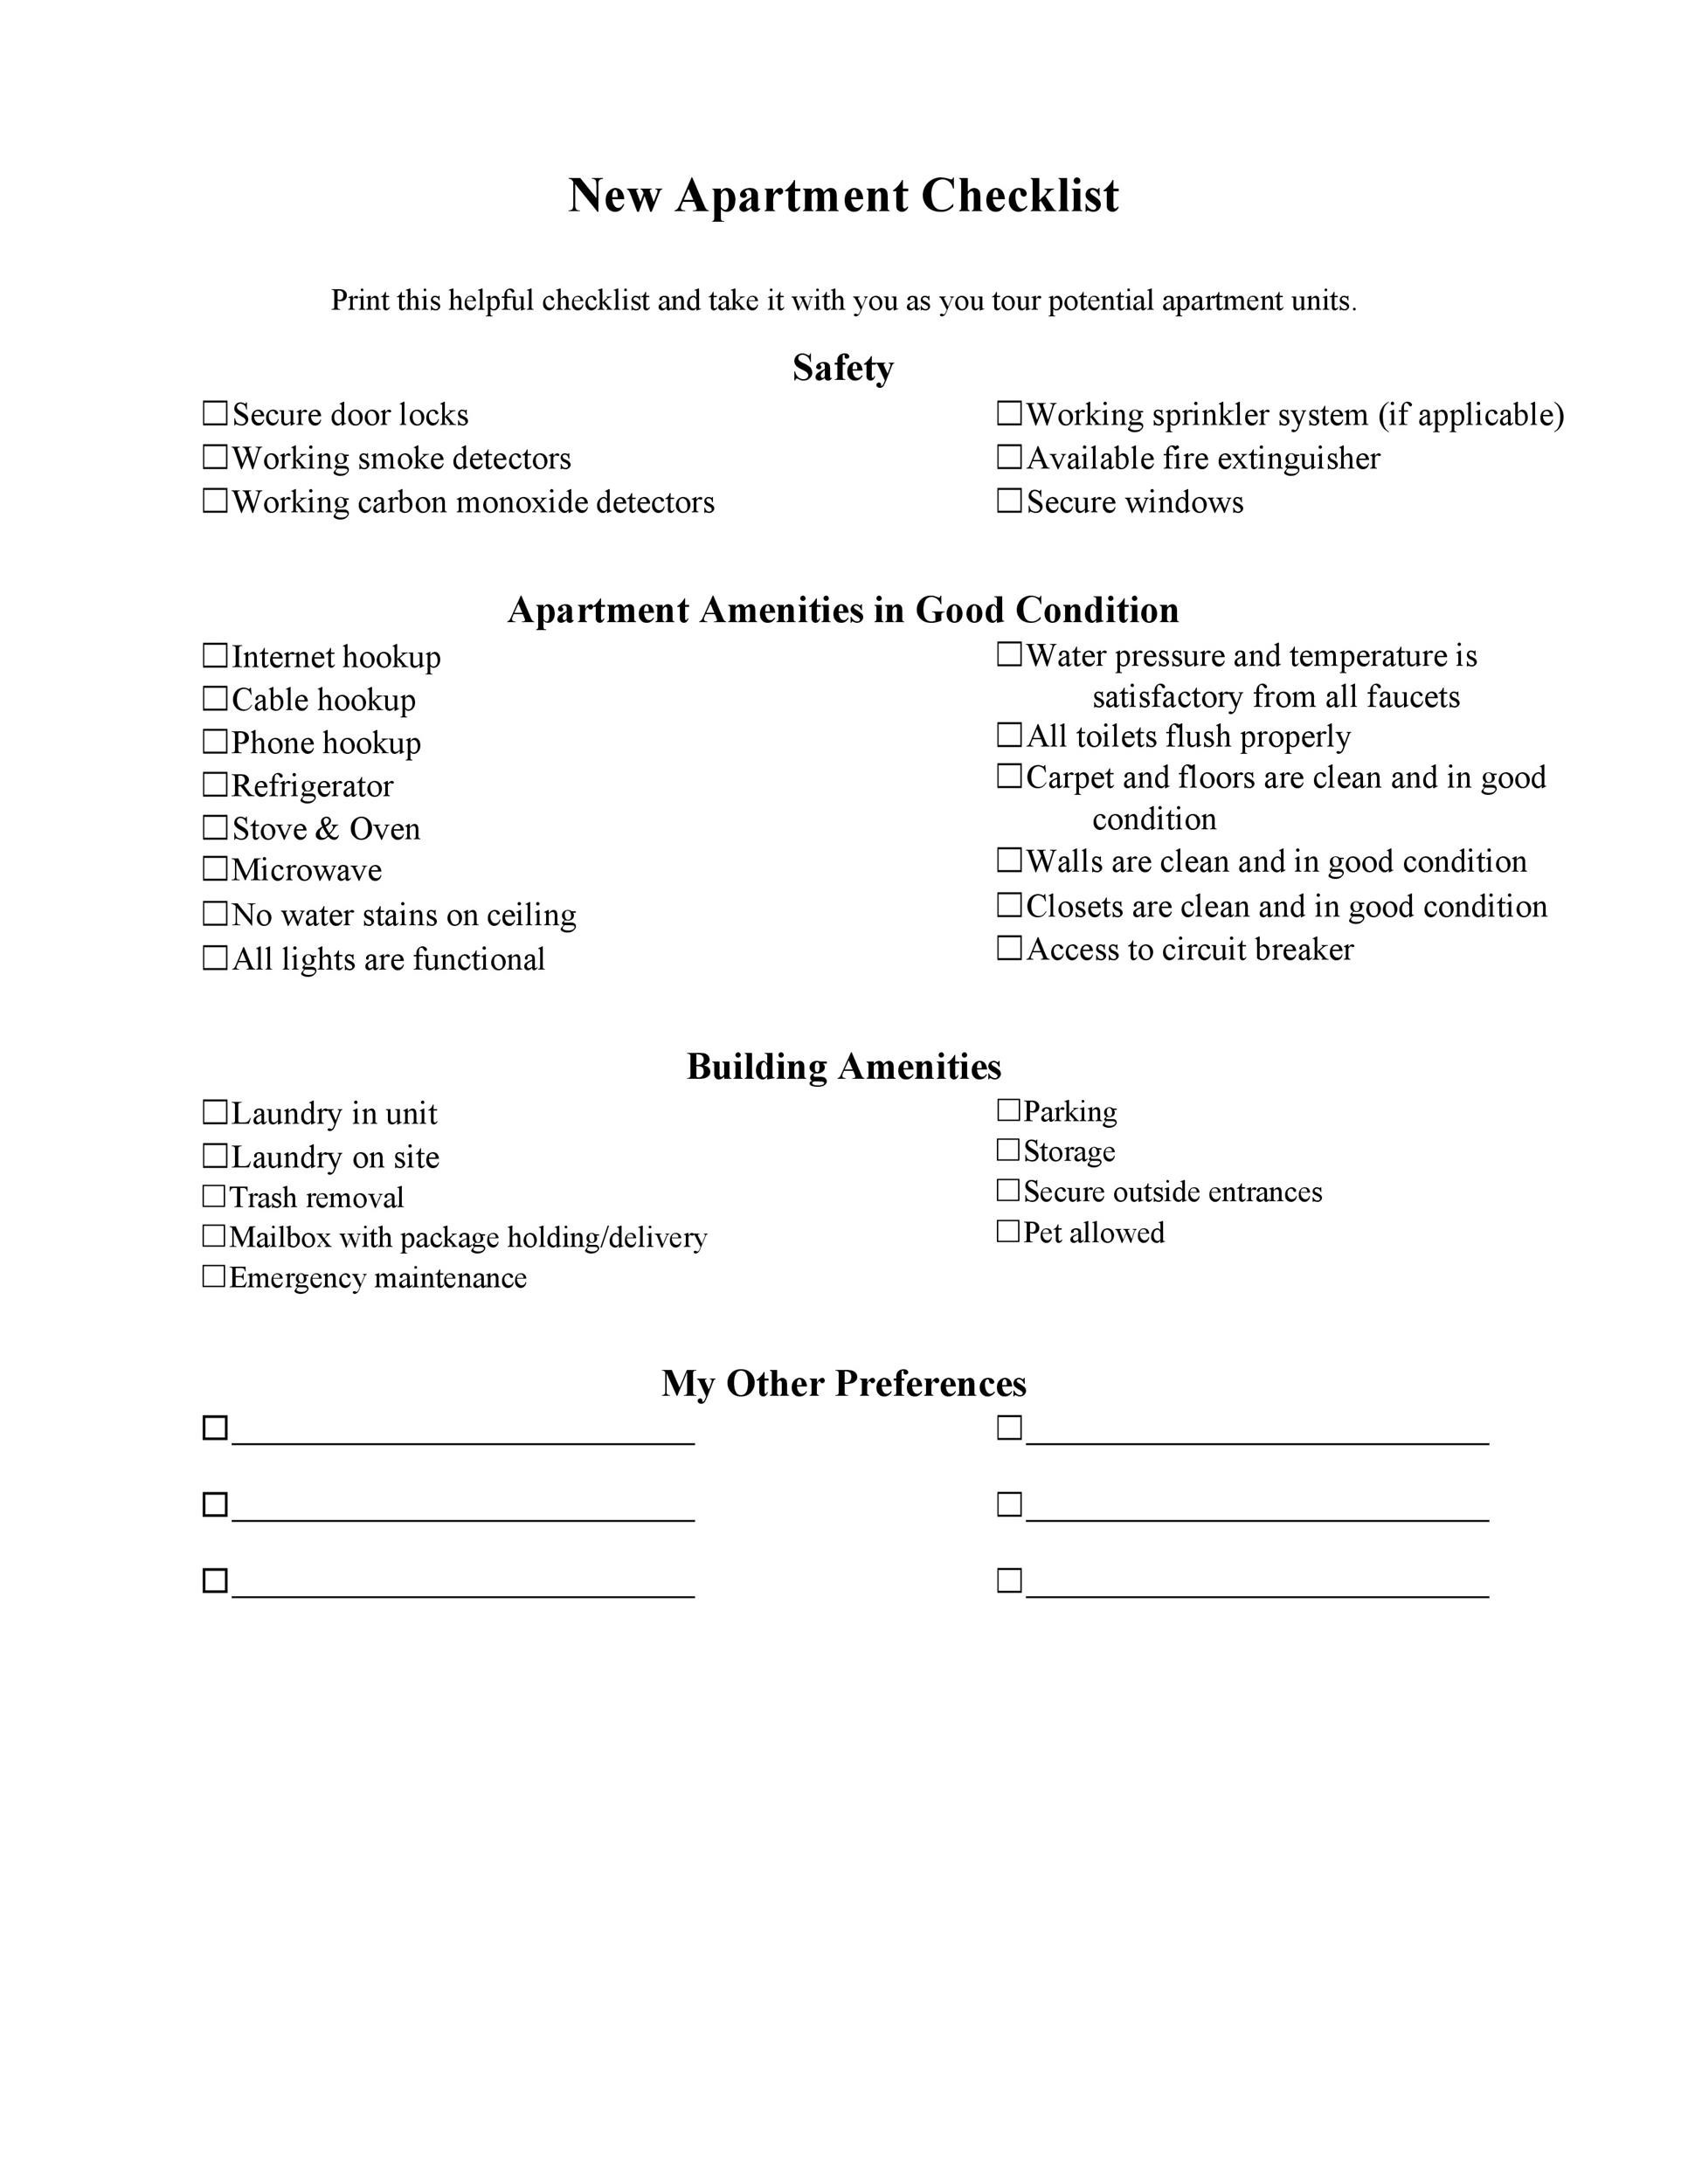 First New Apartment Checklist